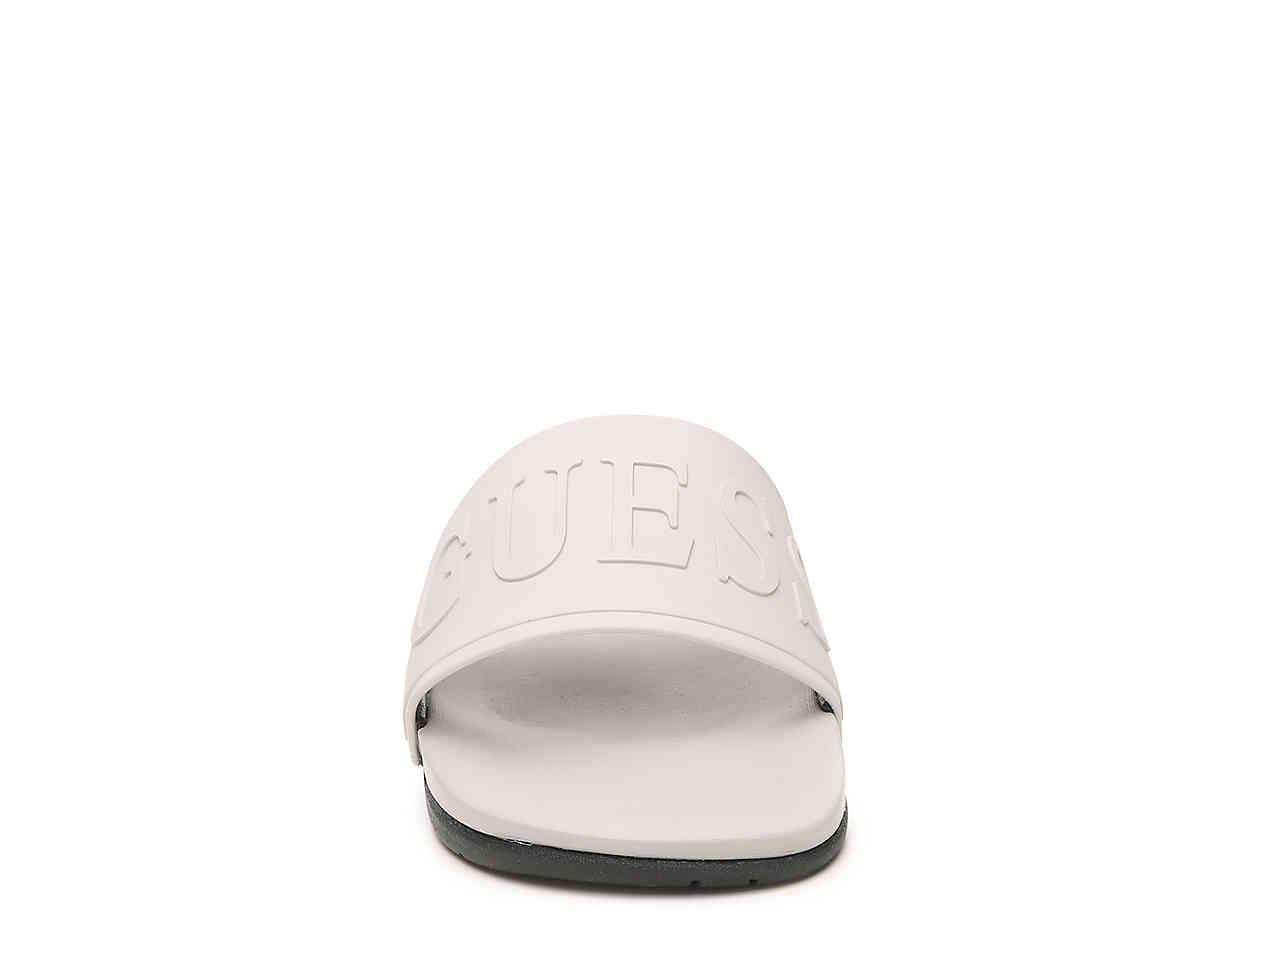 c03631407a4b Guess - Gray Gmdelfino Slide Sandal for Men - Lyst. View fullscreen